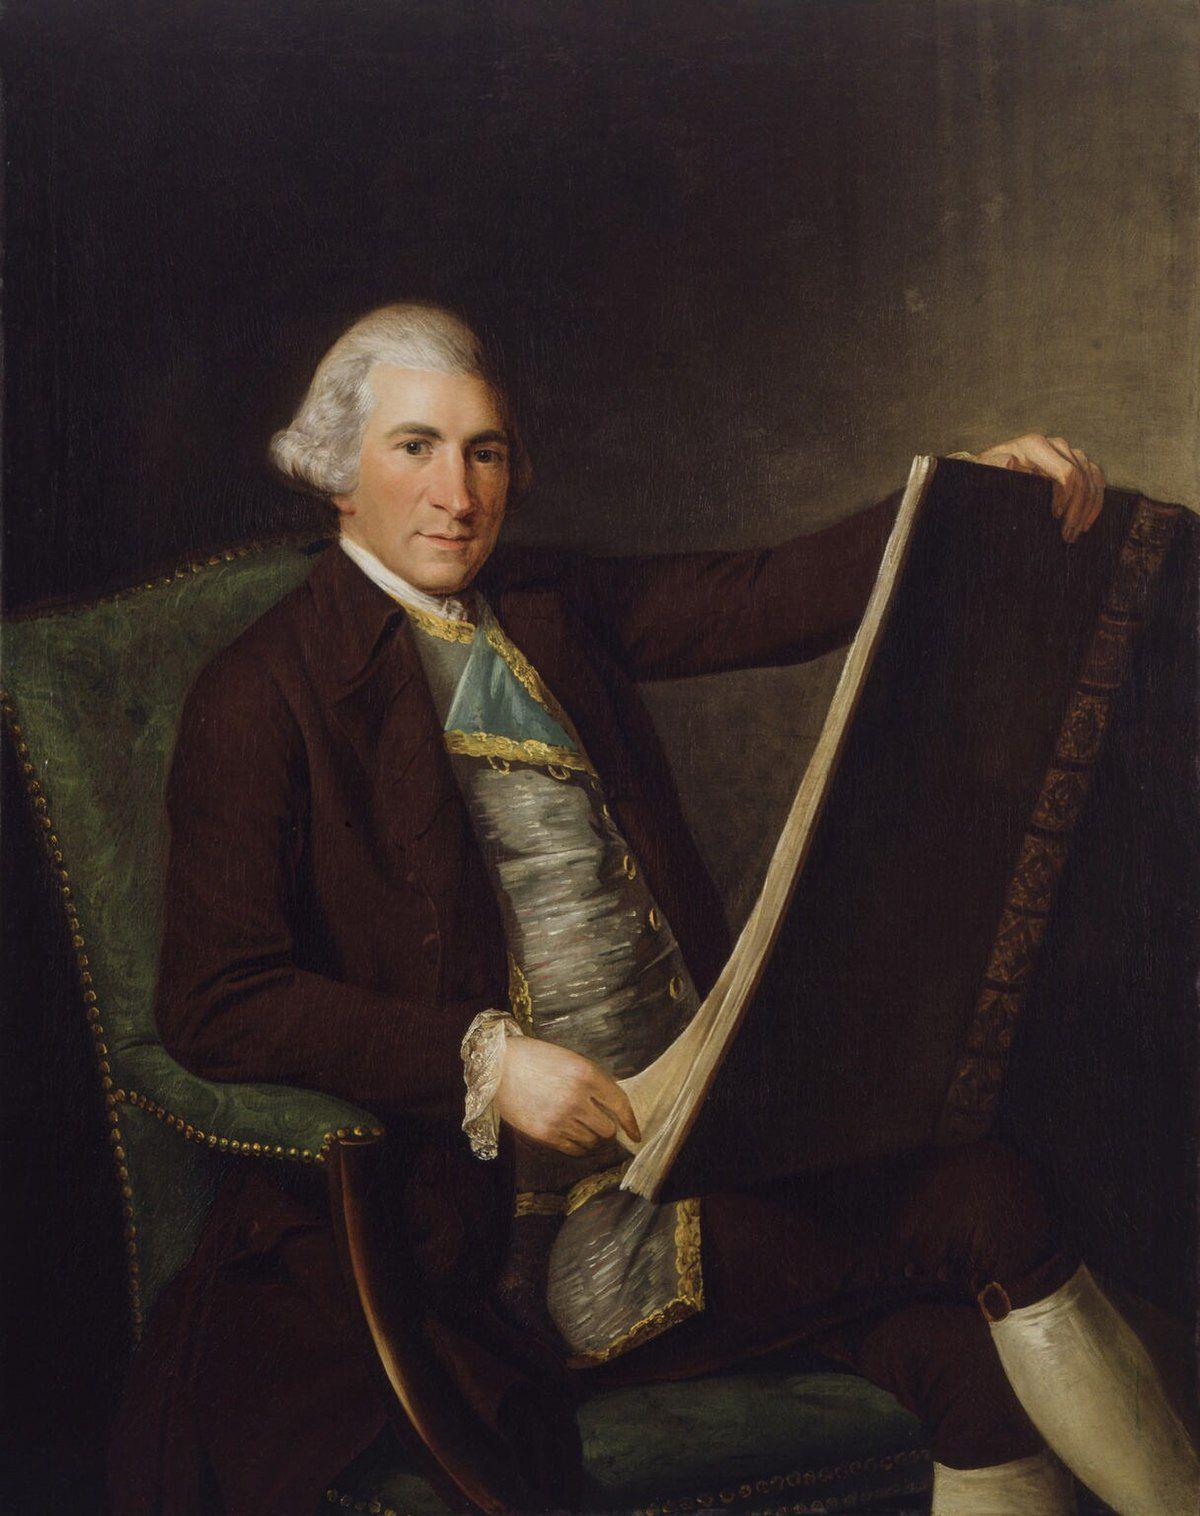 Robert Adam was a celebrated 18th century architect and interior designer